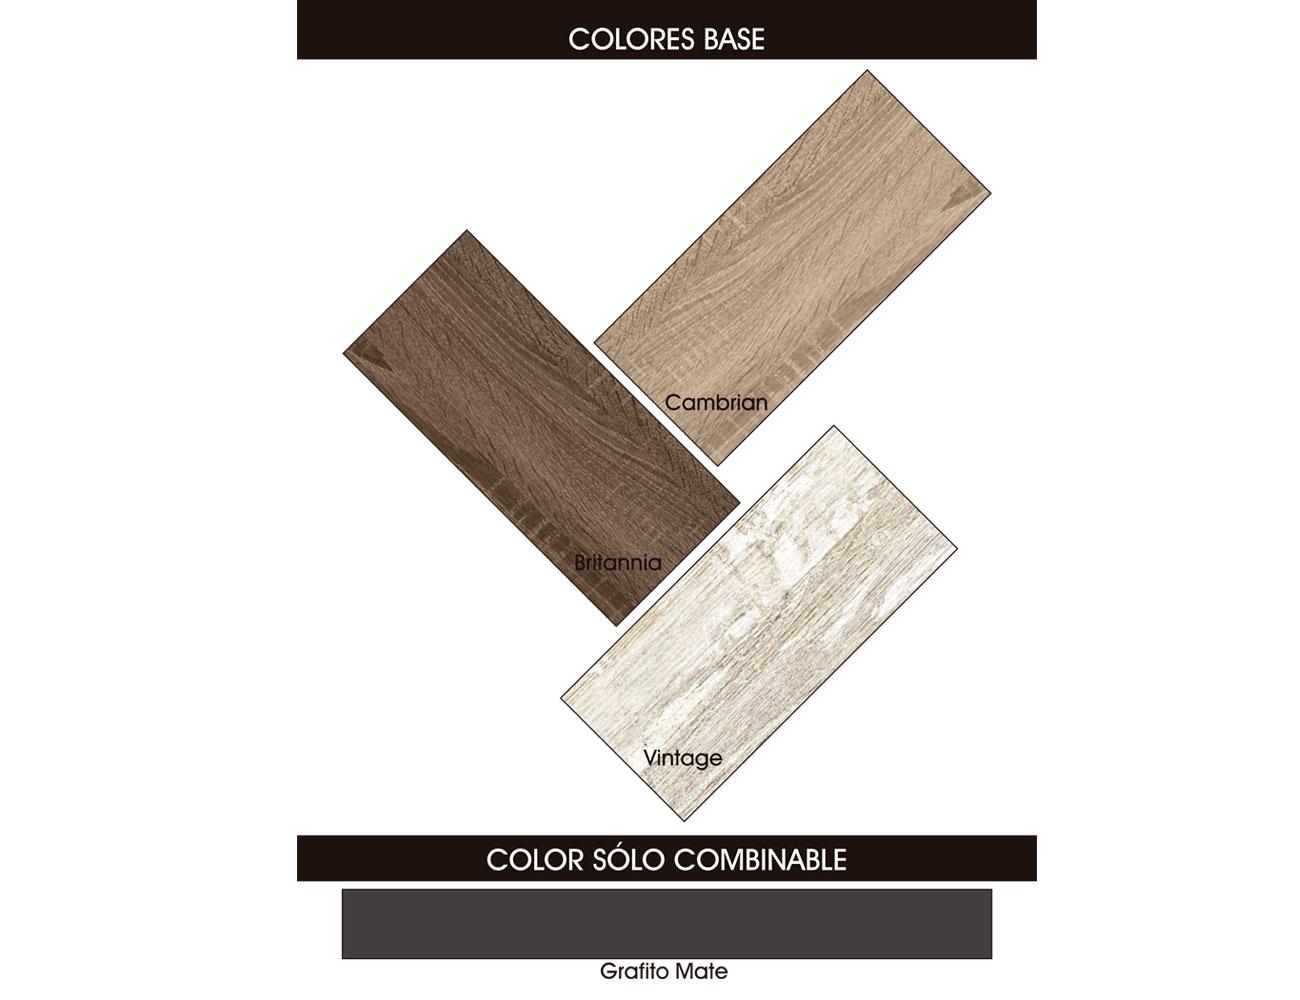 Colores 256